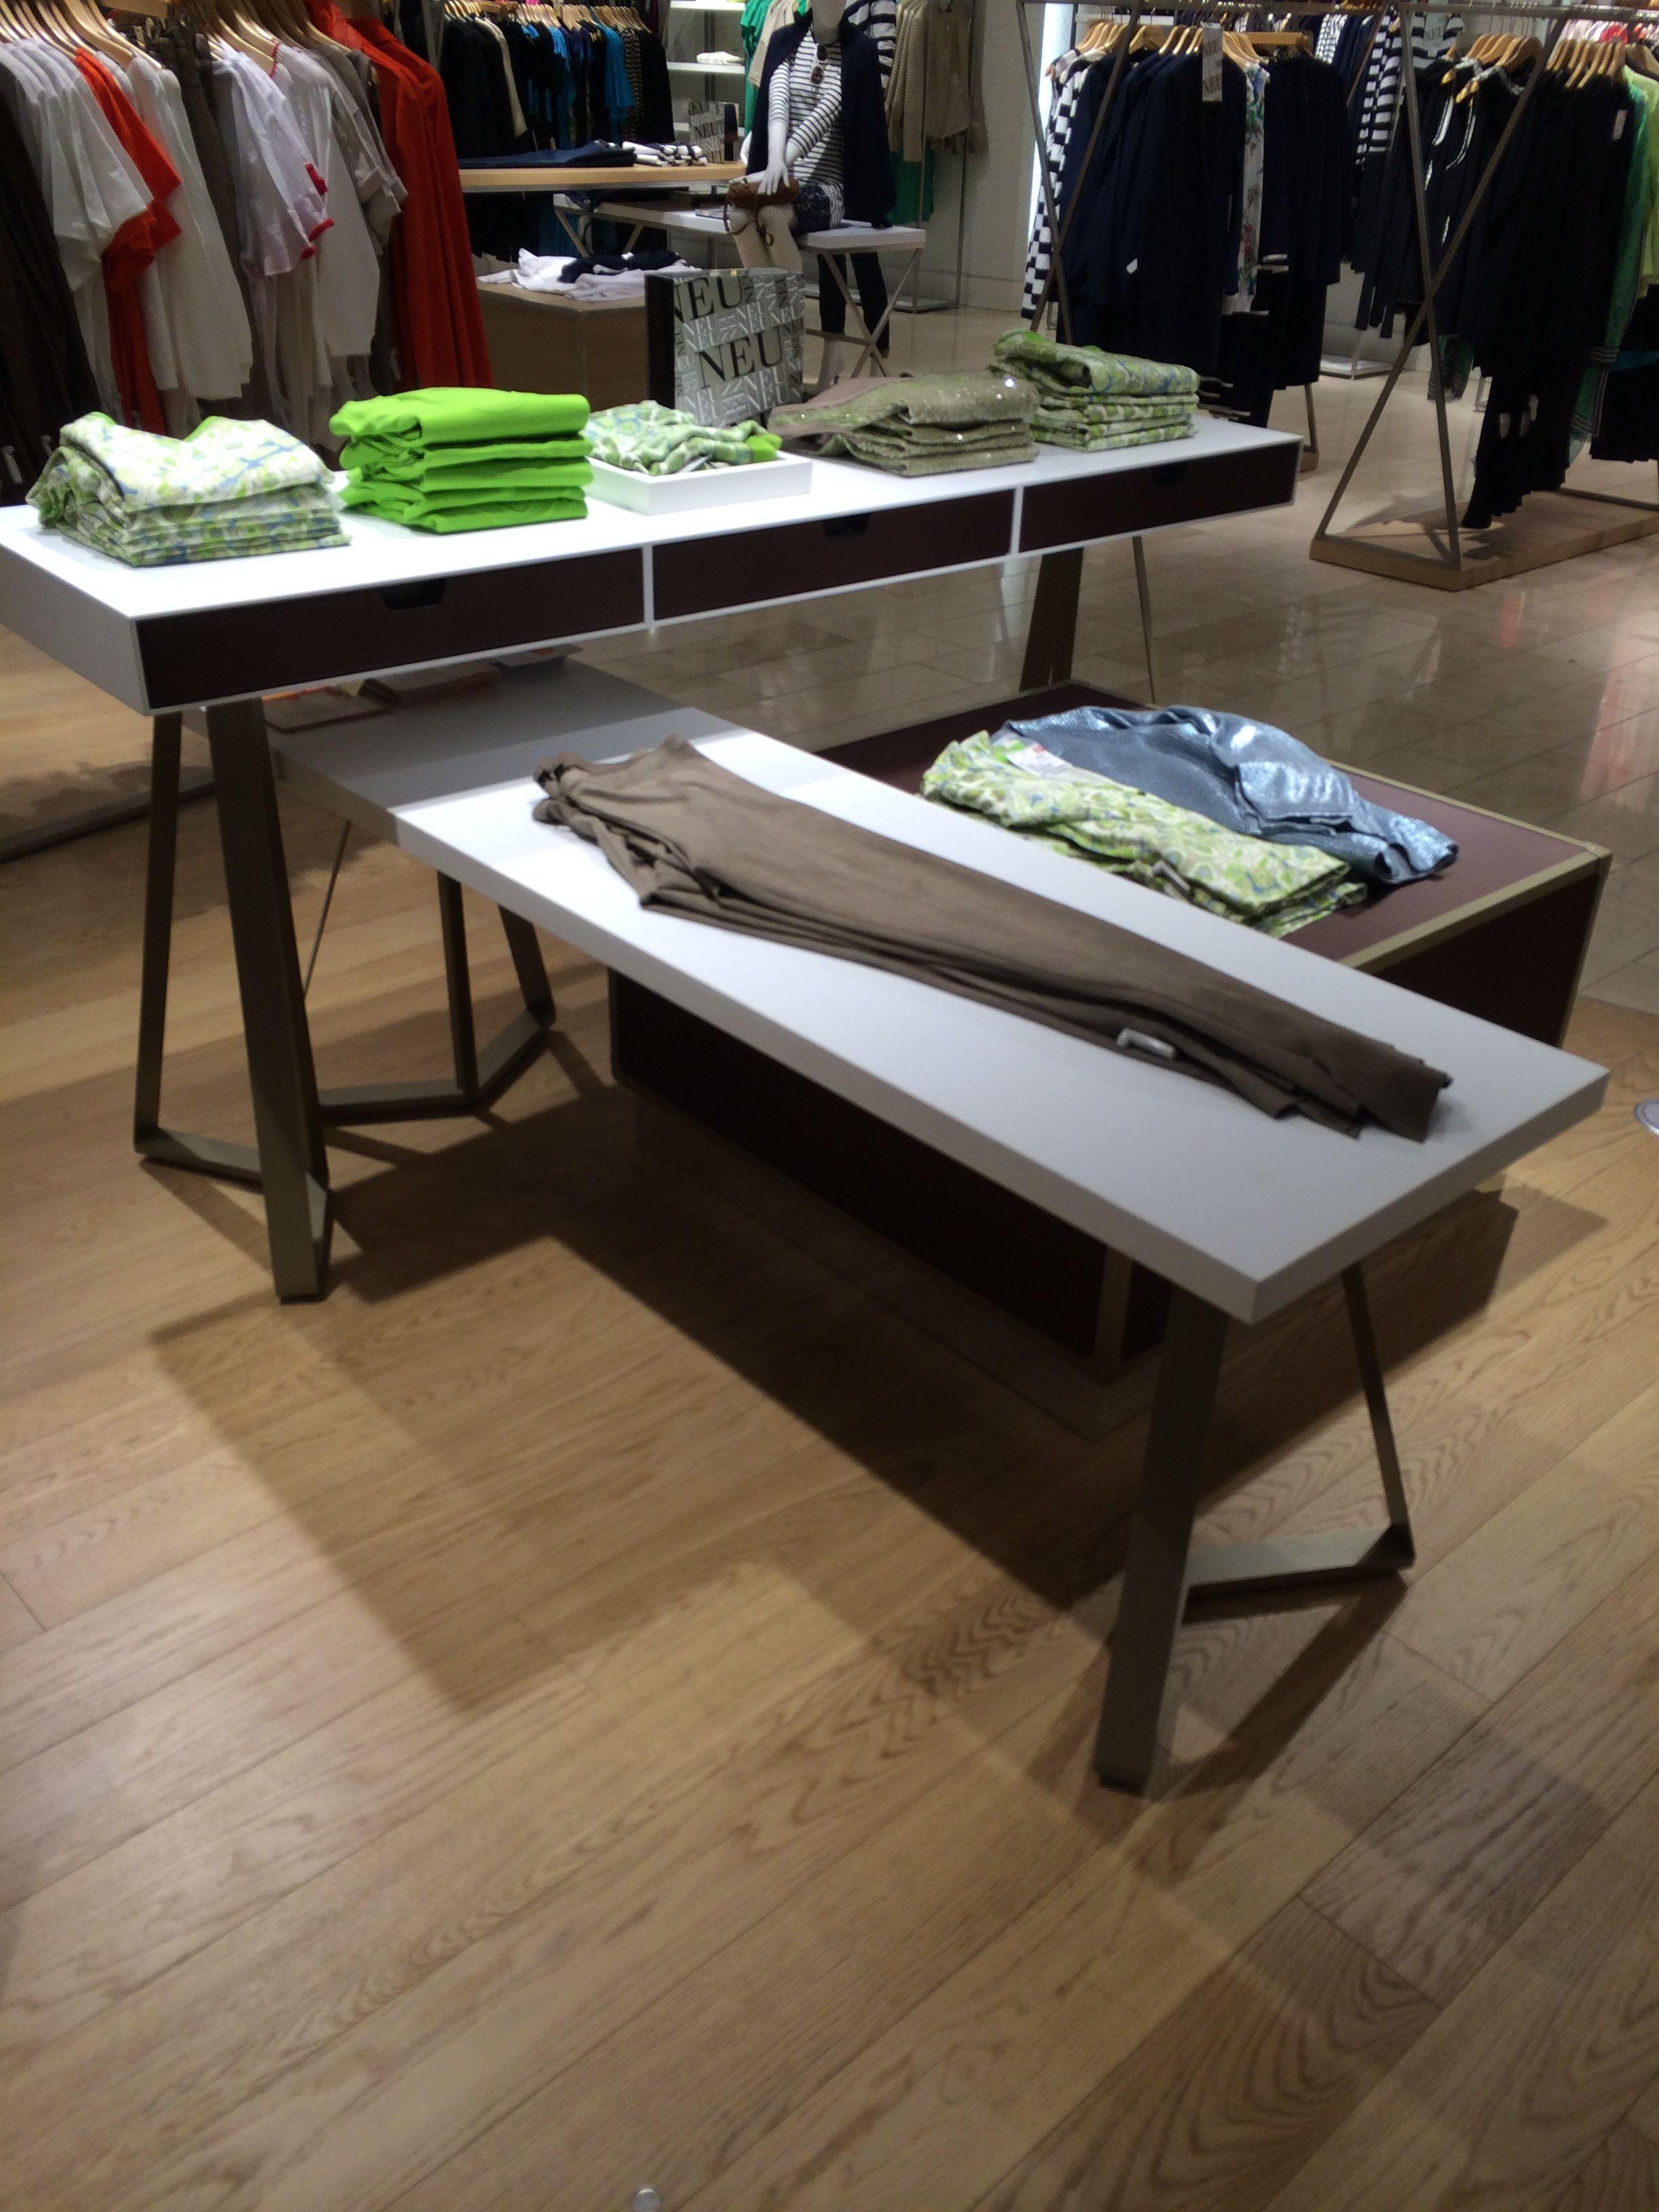 Dusseldorf Retail   Mannequins, Retail Fixtures, Display Tables, Clothing  Racks, Visual Merchandising